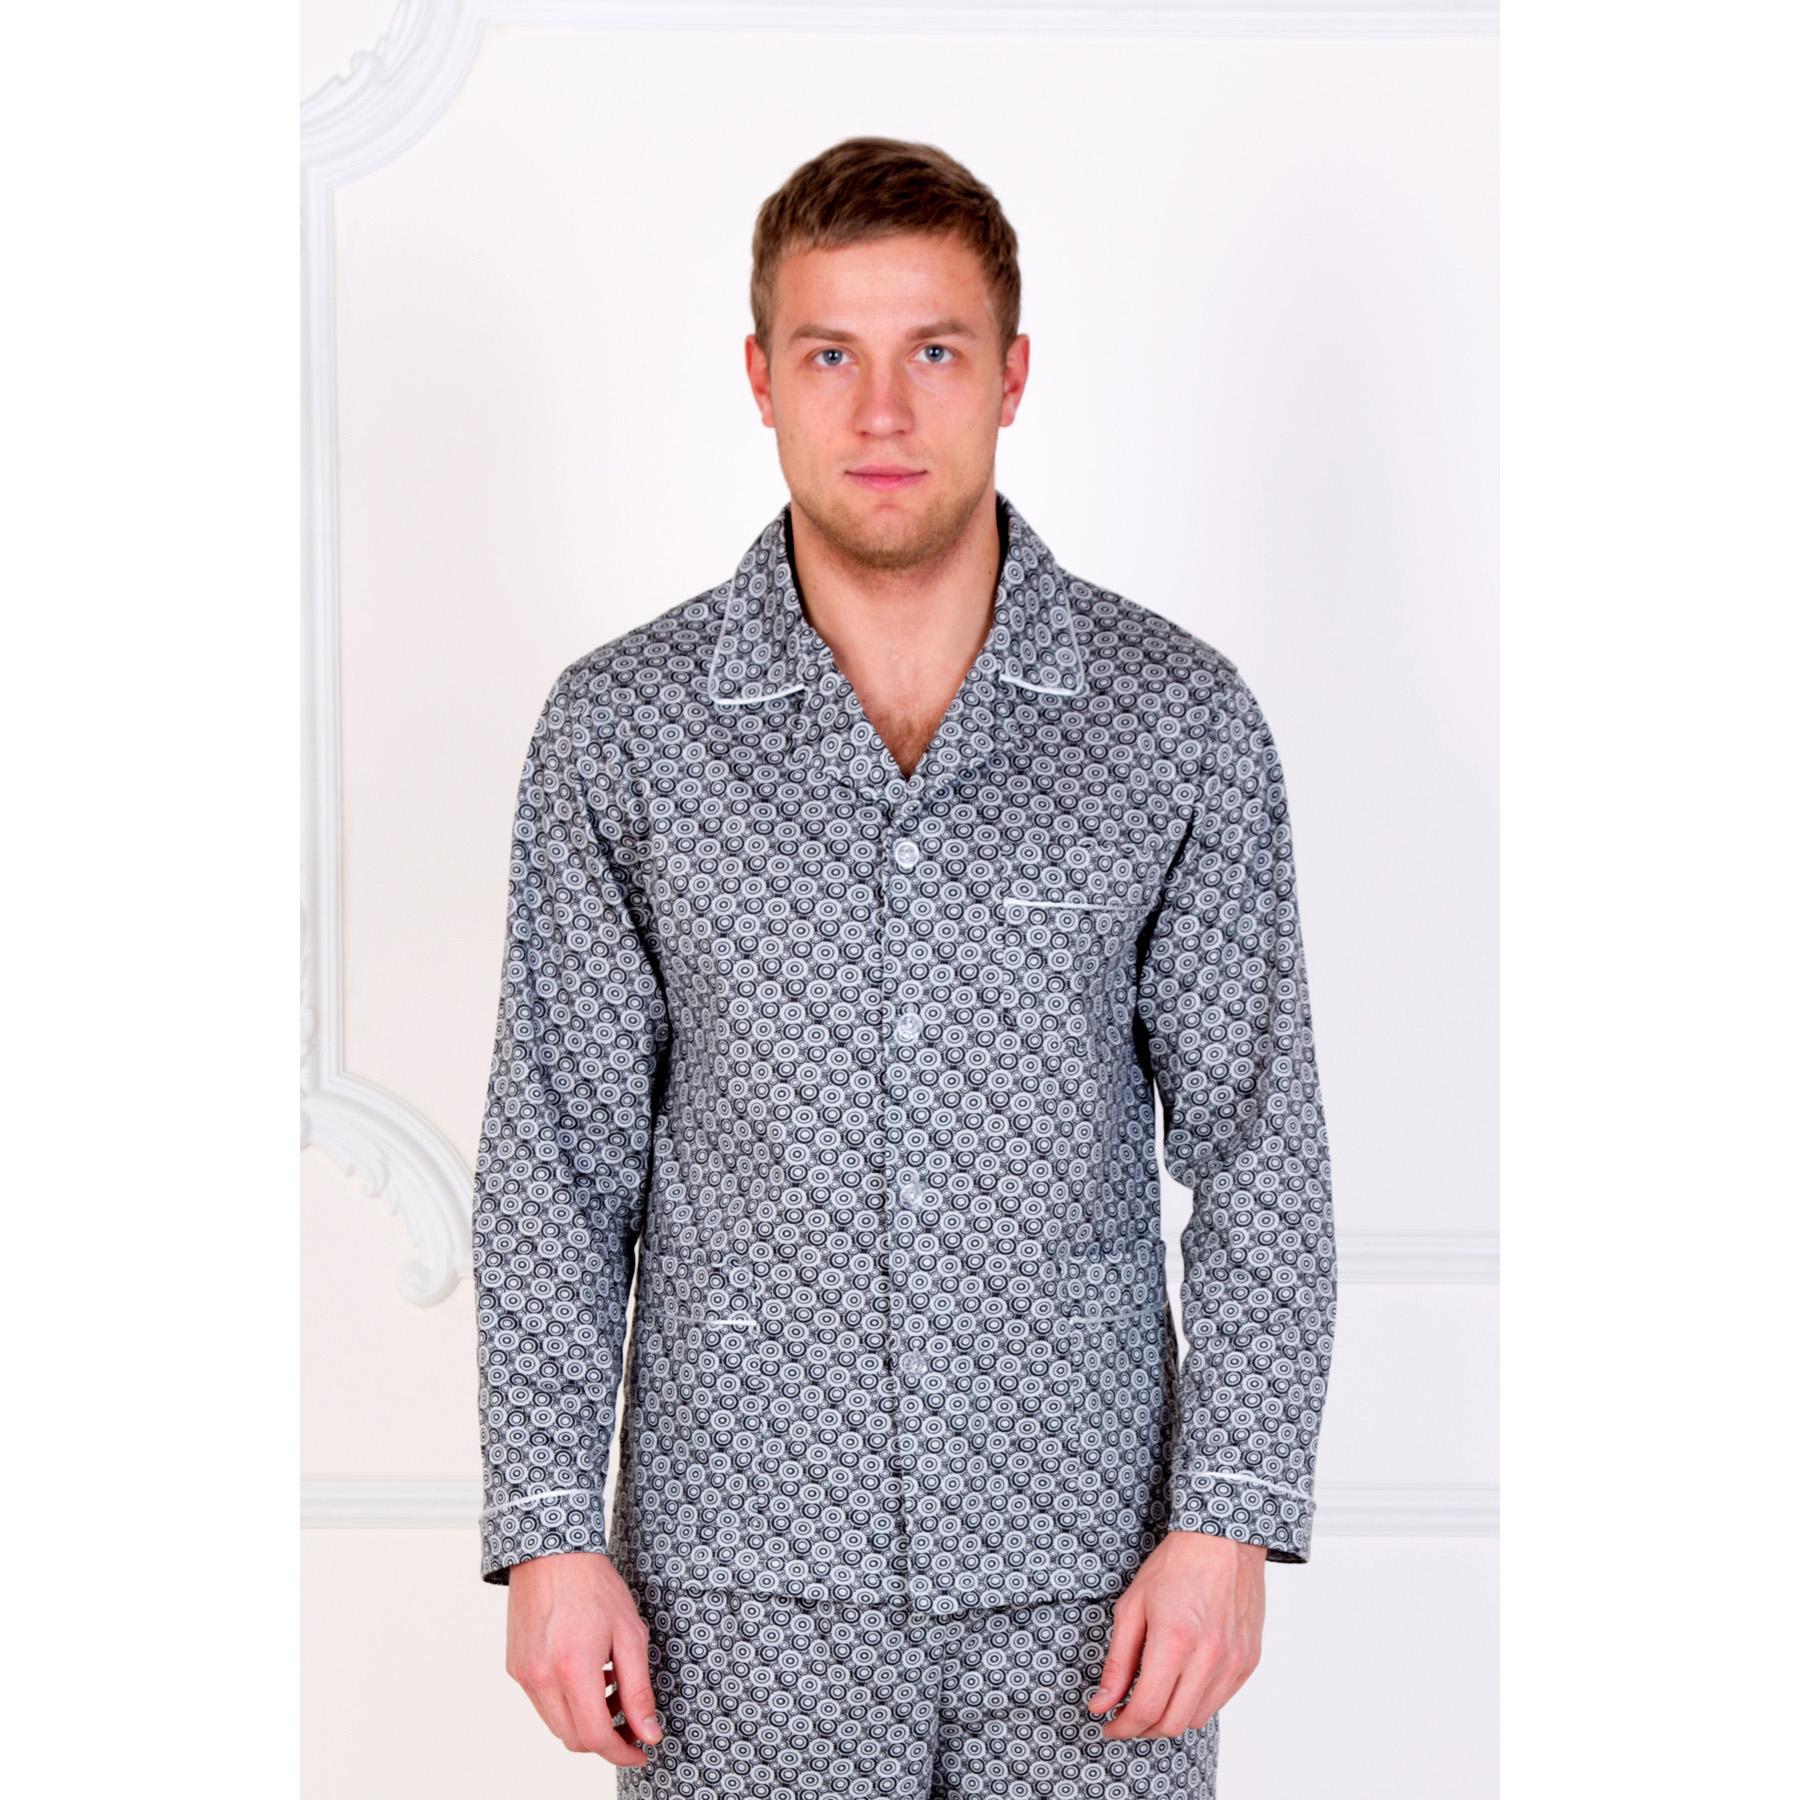 Мужская пижама  Ричмонд , размер 62 - Мужская одежда артикул: 16867